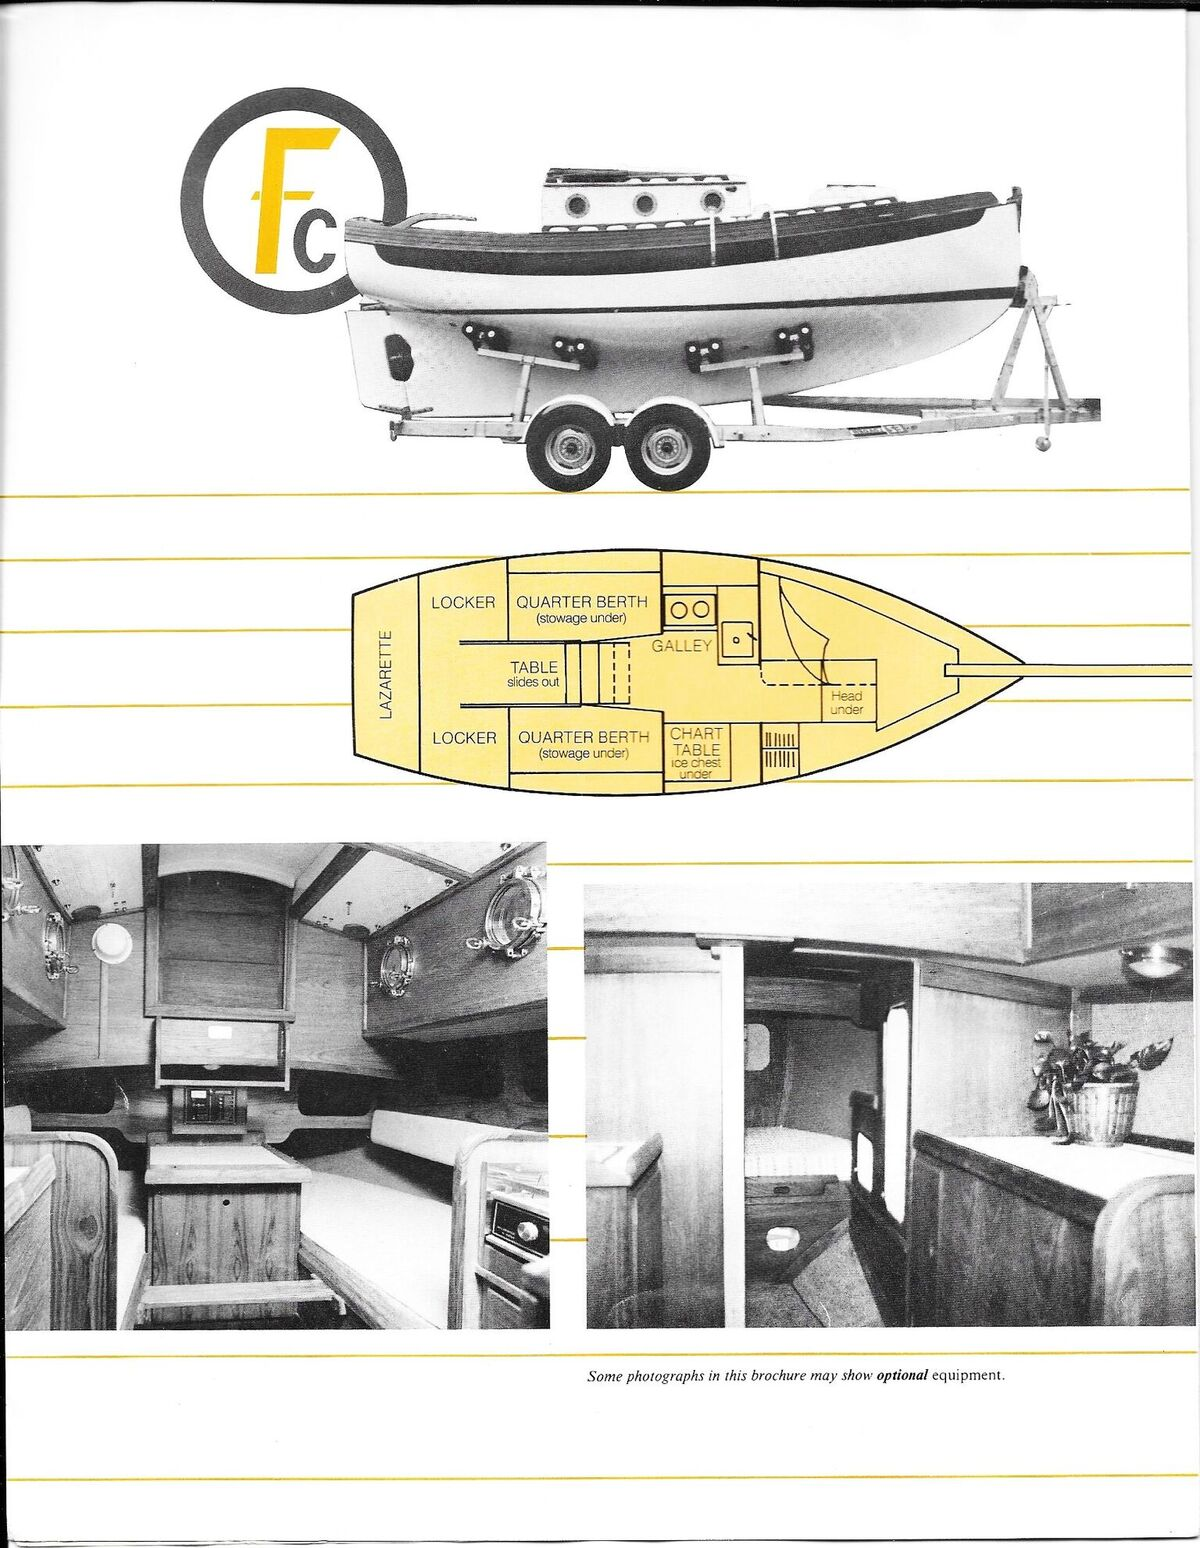 FC 22 brochure